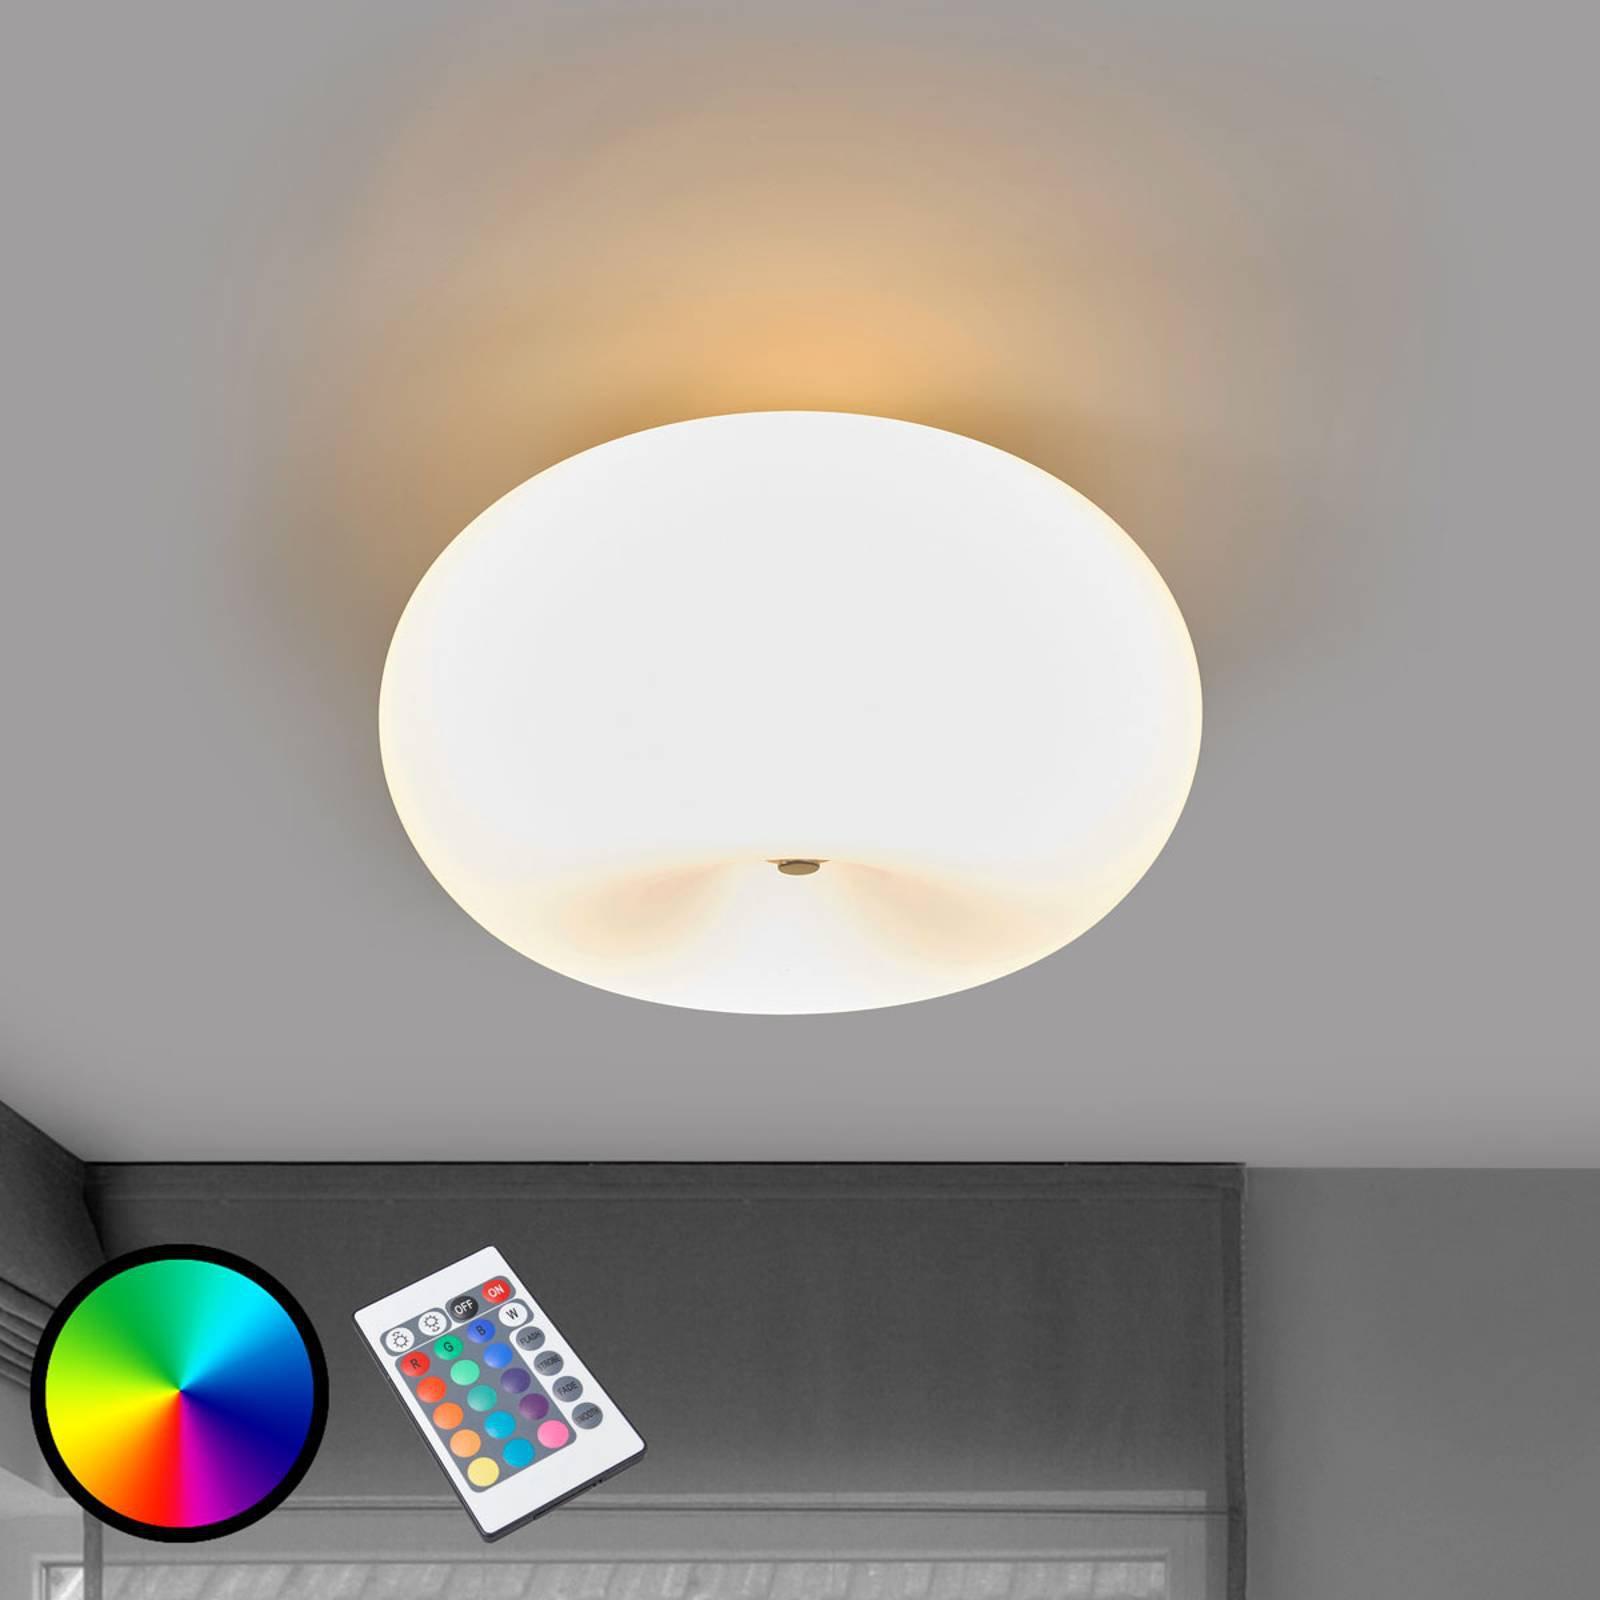 LED taklampe Optica-C RGBW med fjernkontroll